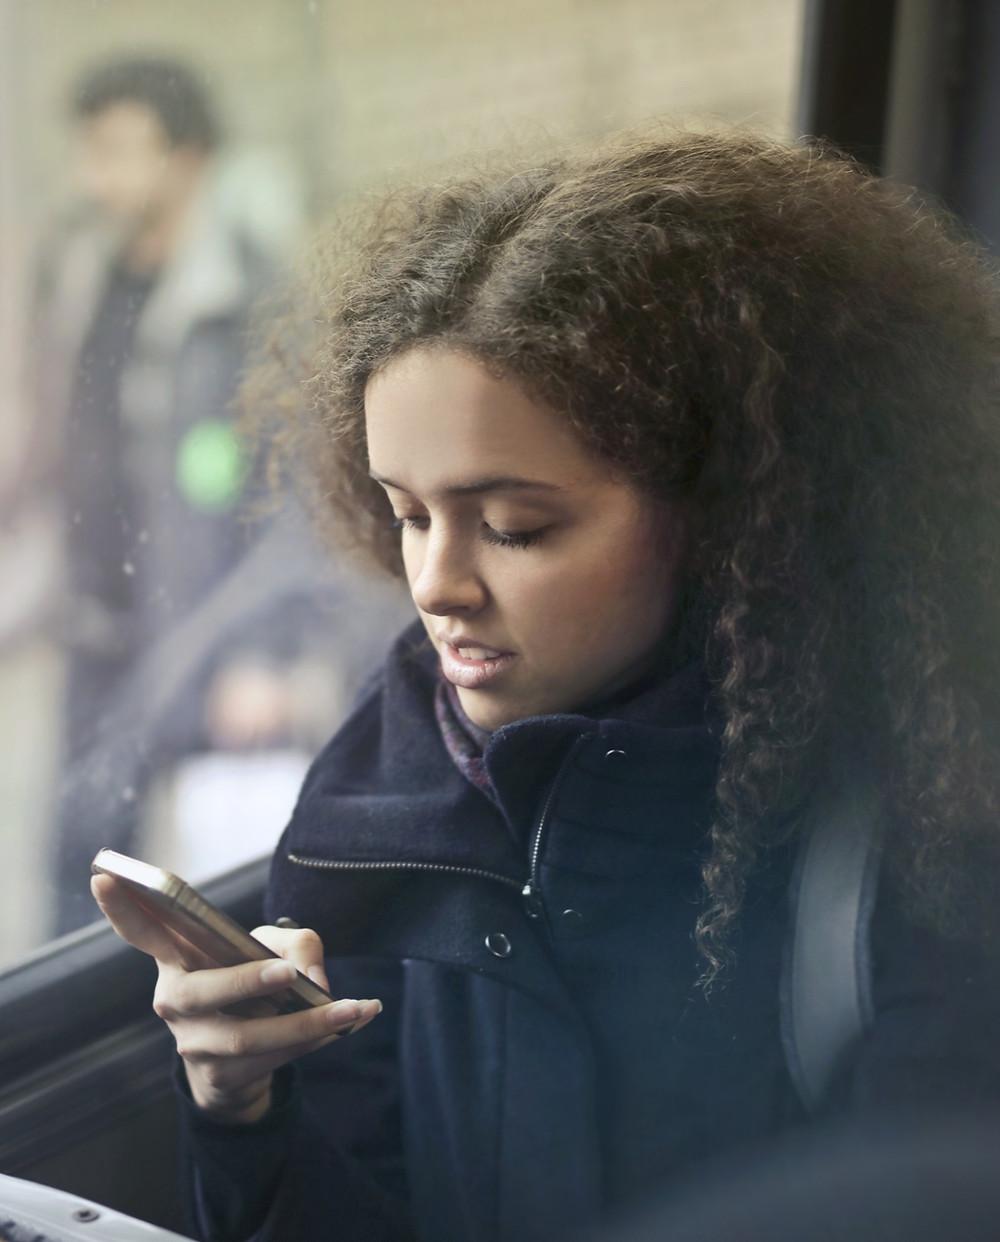 Teen girl on bus using mobile phone